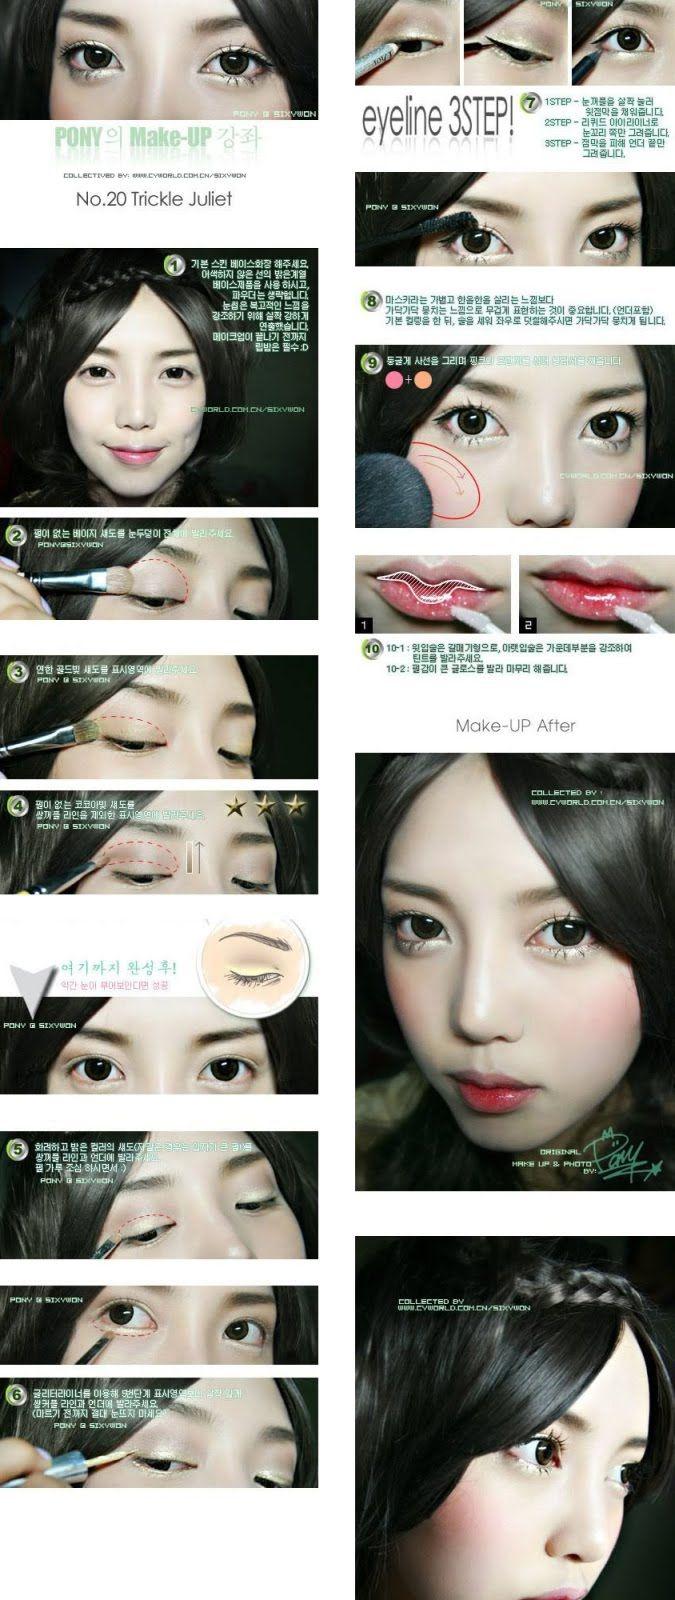 Beautiful-life: Interests - Makeup Tutorial By Ulzzang Pony  Trickle Juliet # pony`s makeup book on kstargoods.com